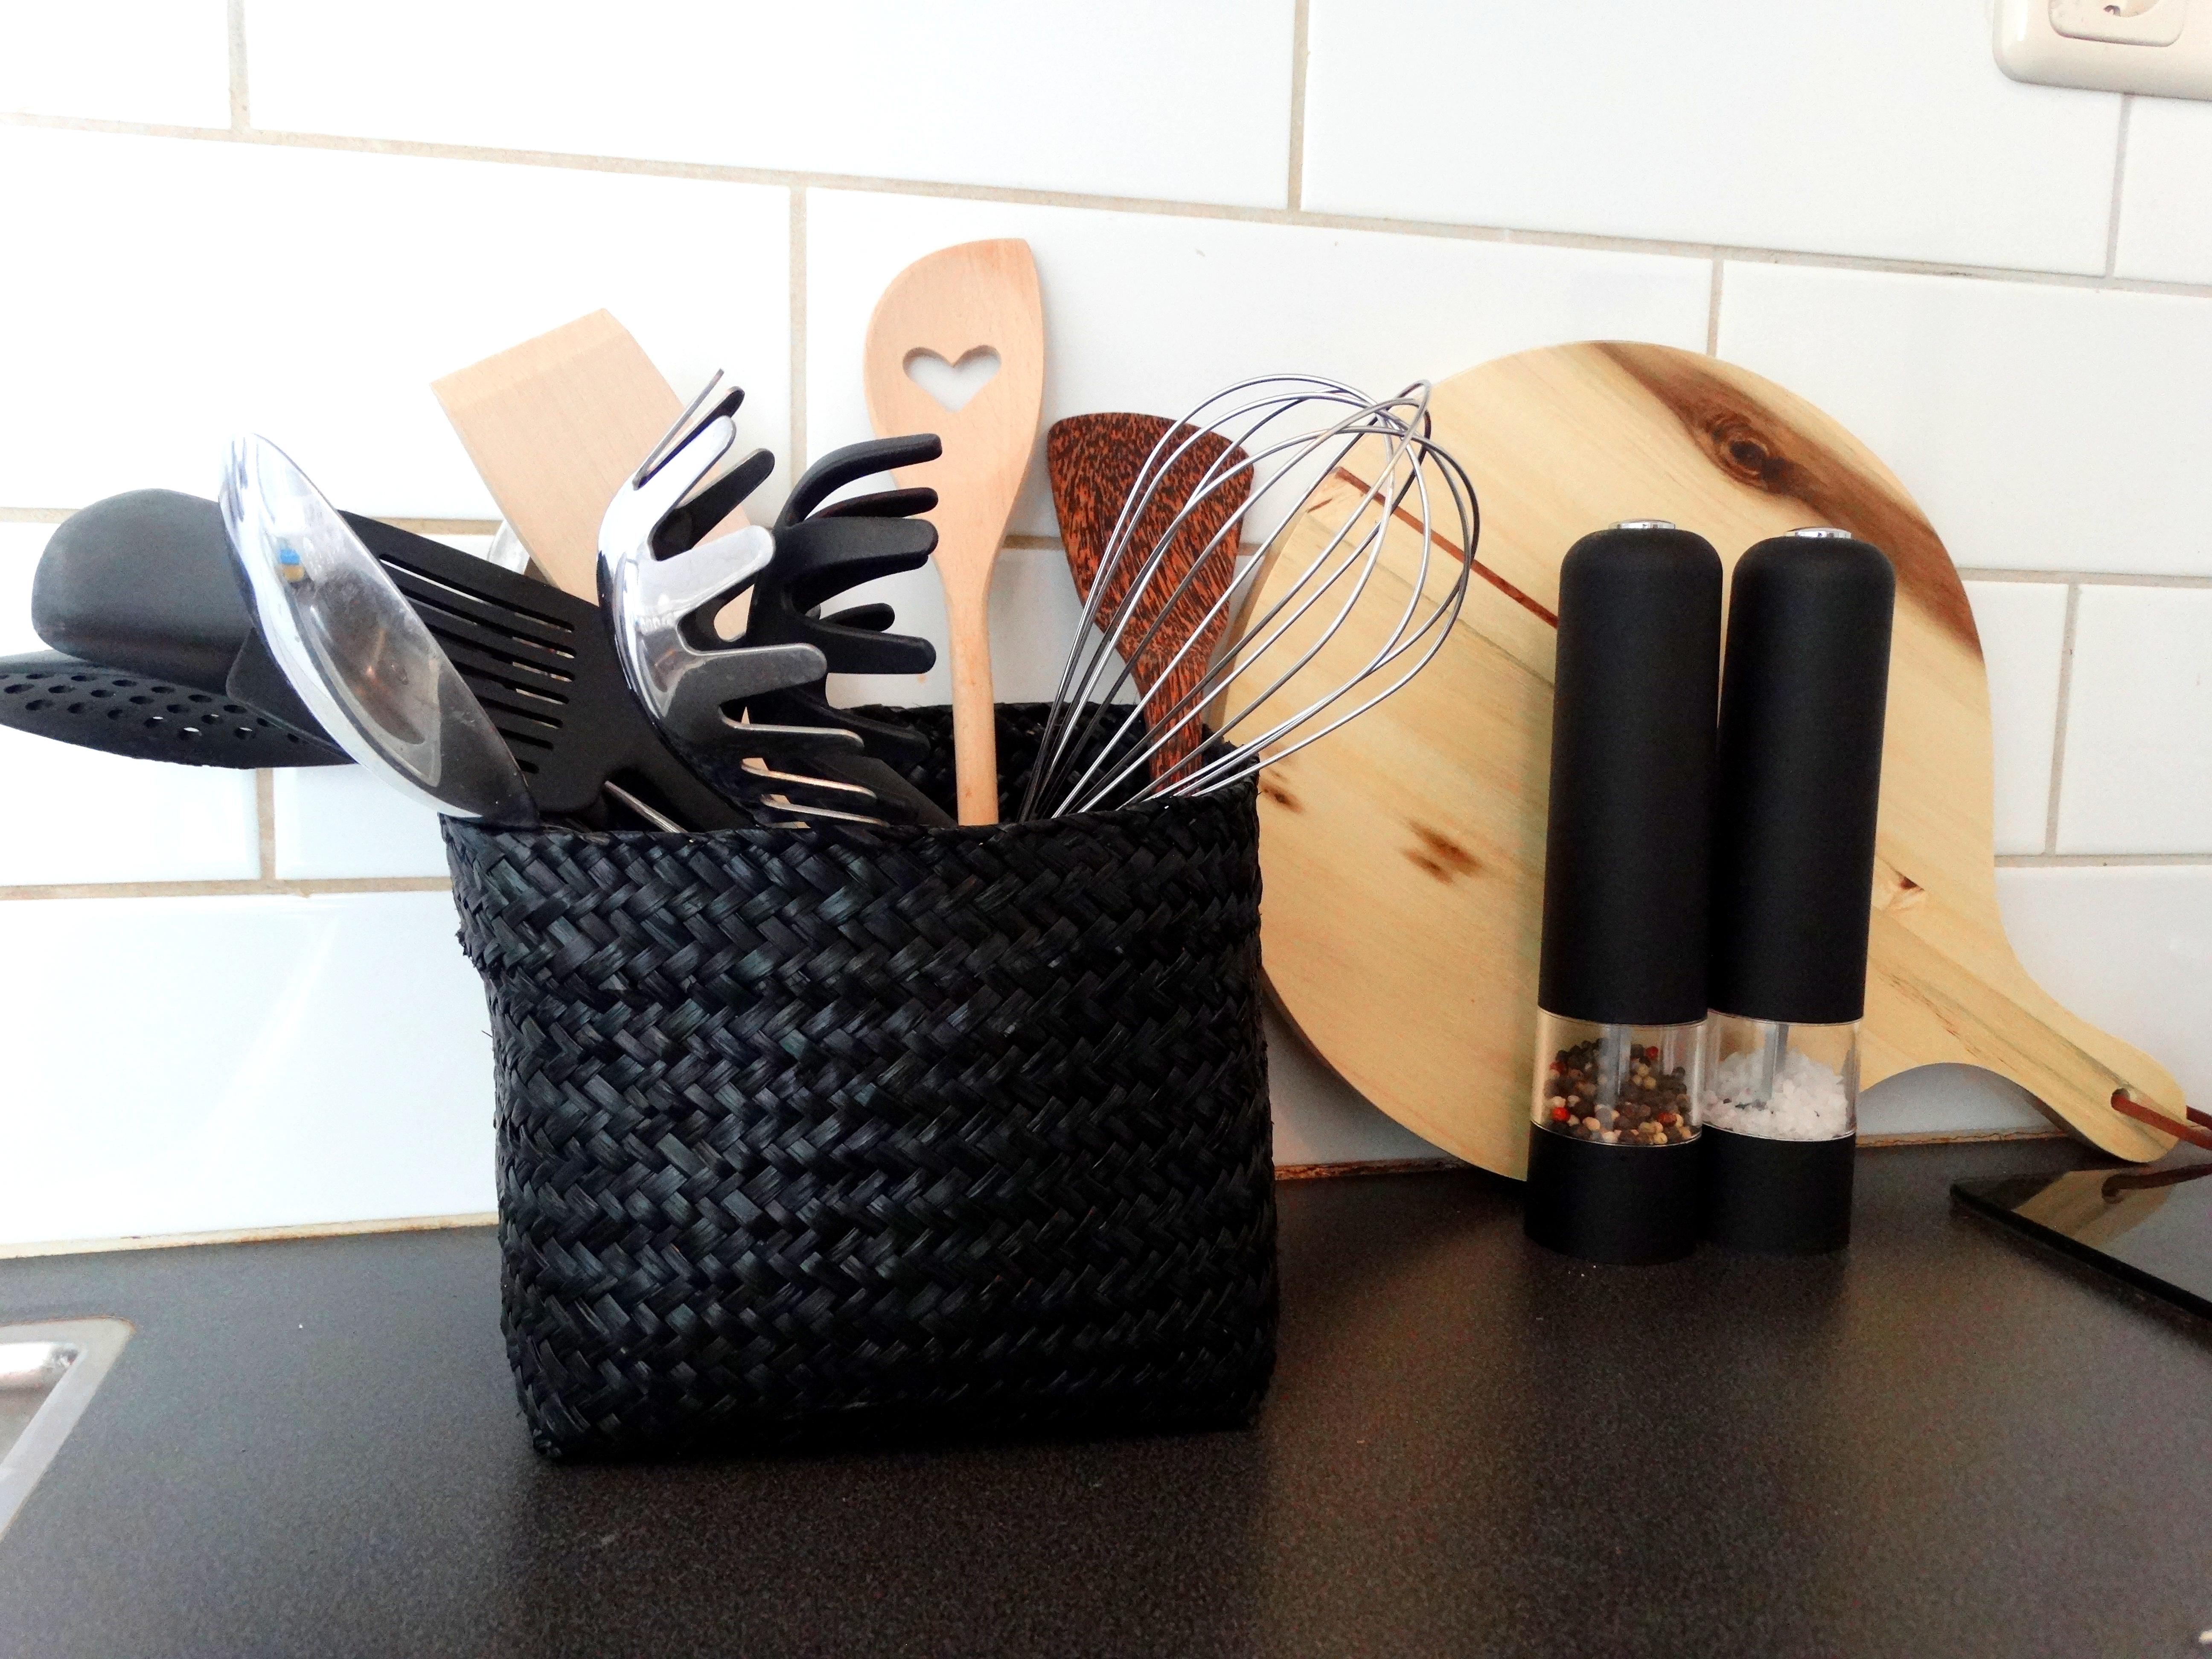 Nieuwe Keuken Ikea : Mand ikea plank action nieuwe keuken all lovely things